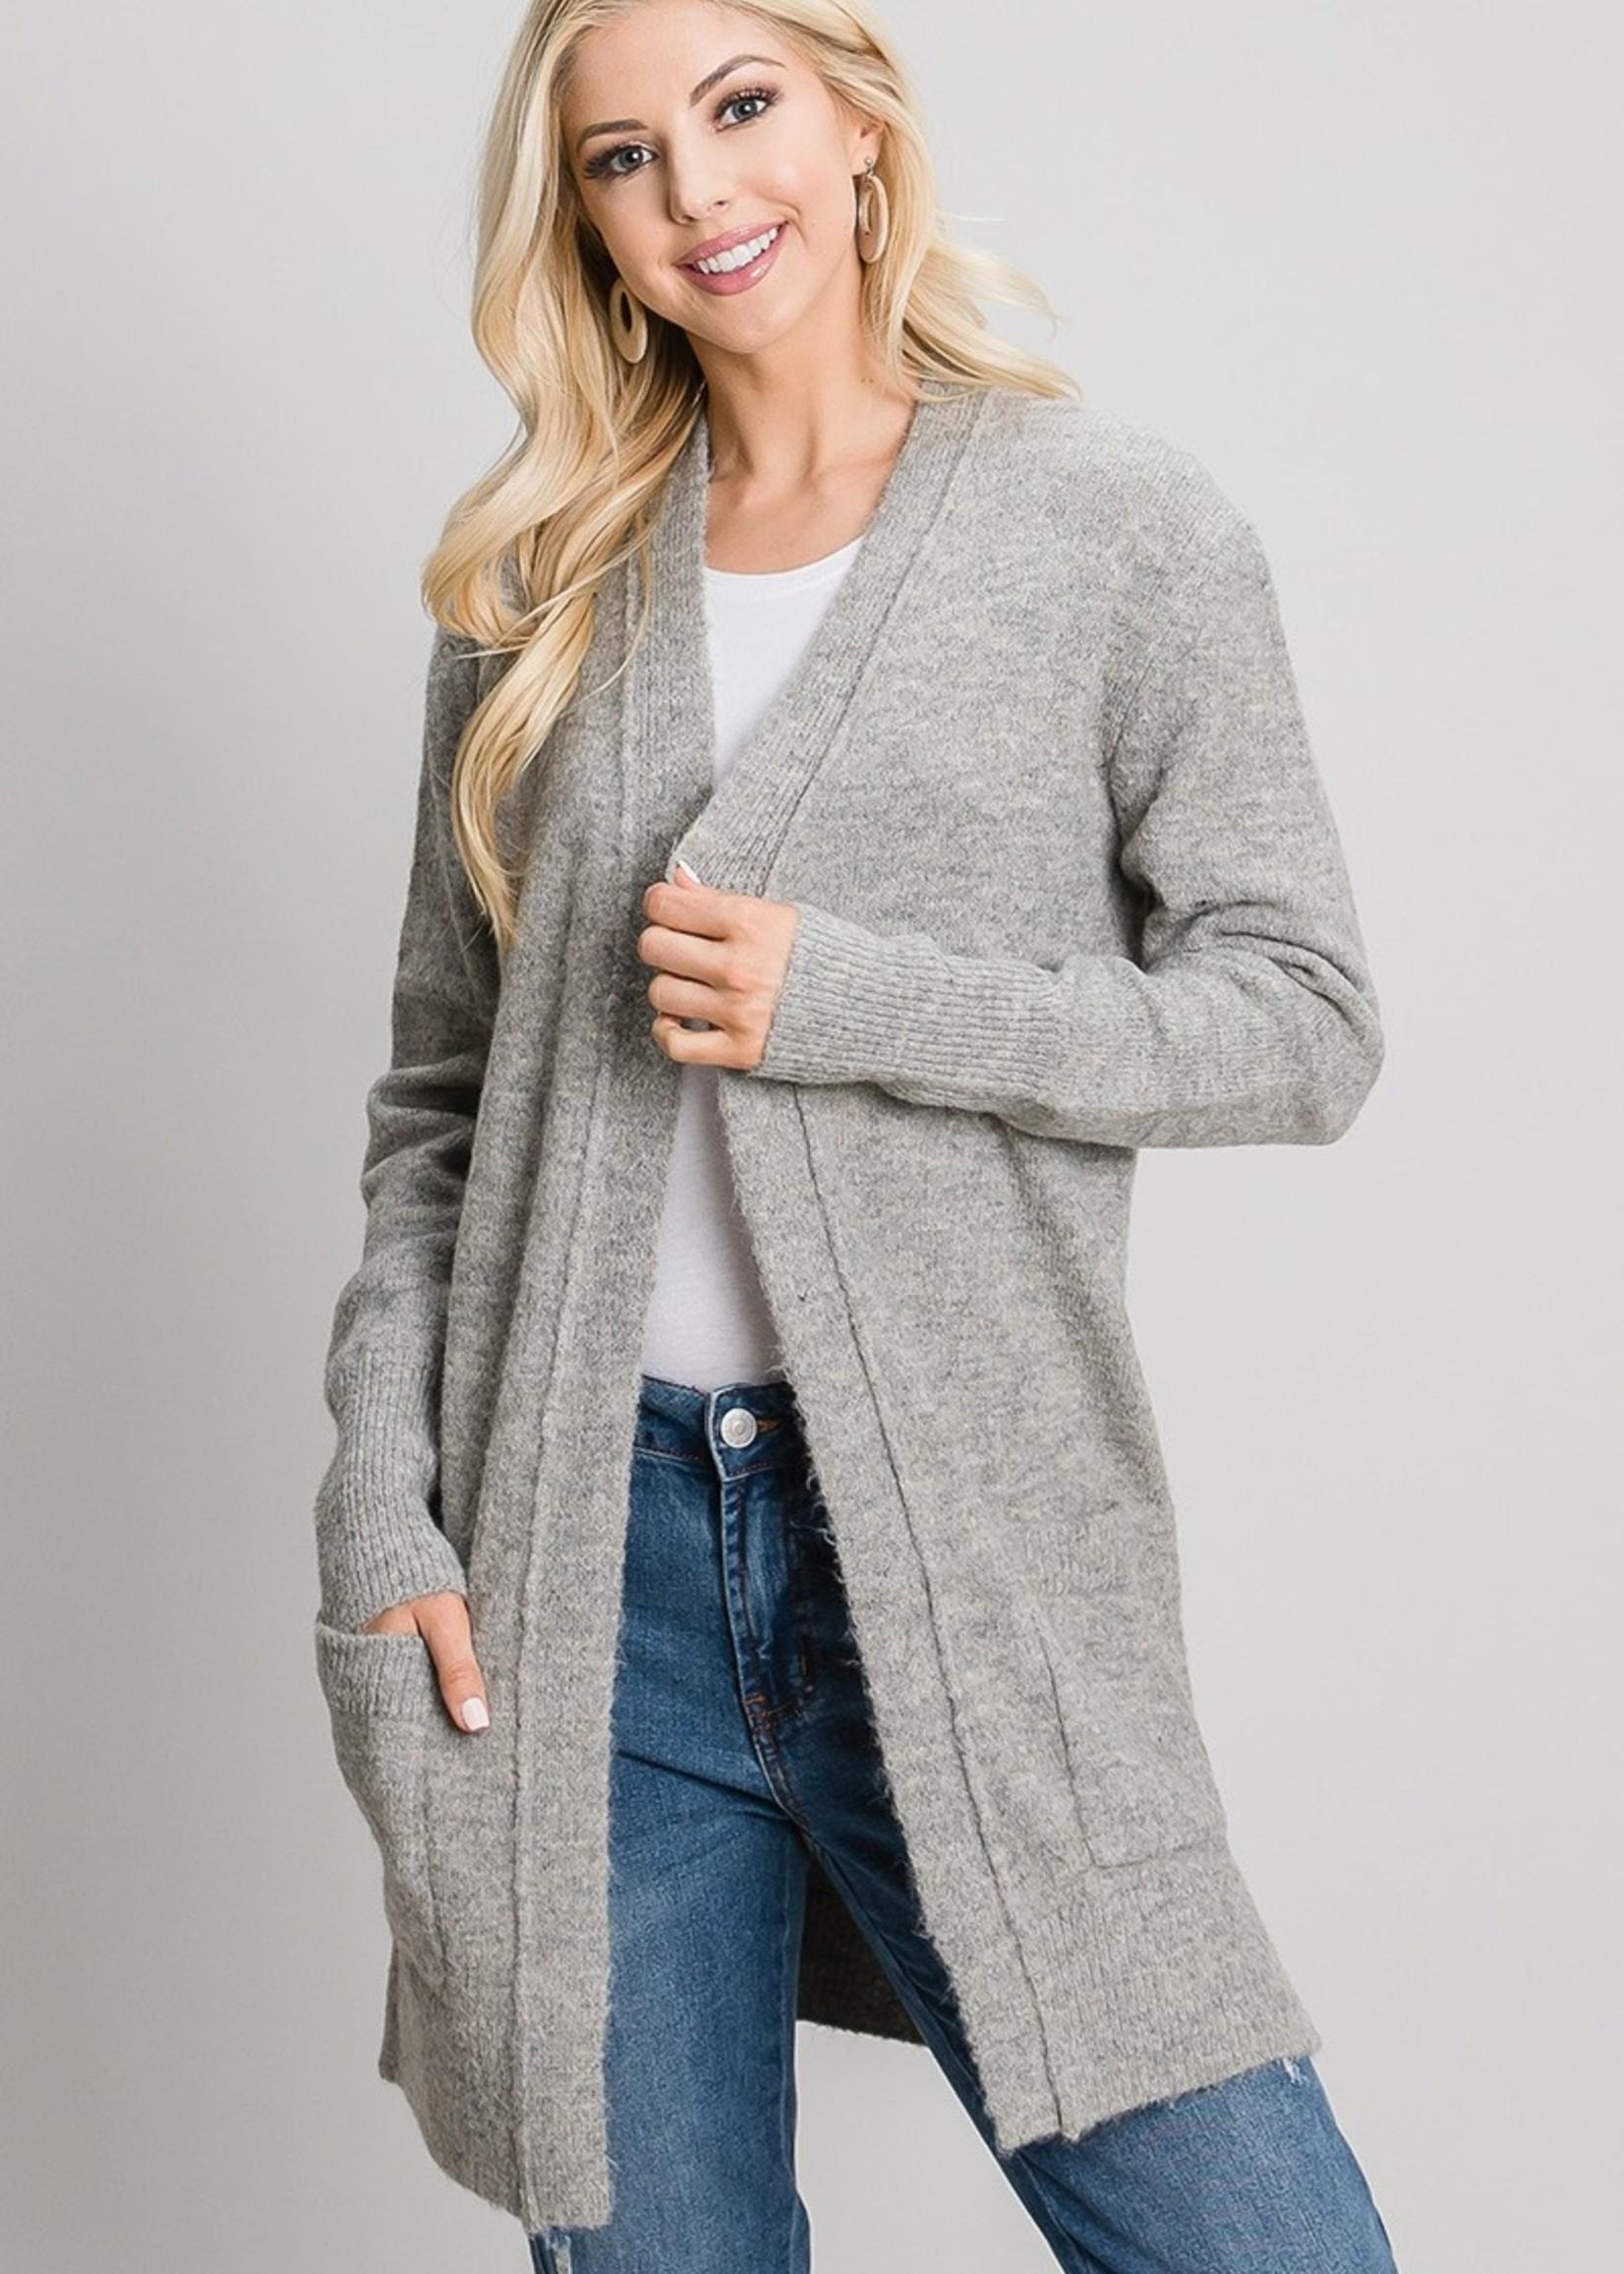 Sweater Cardigan - Heather Grey